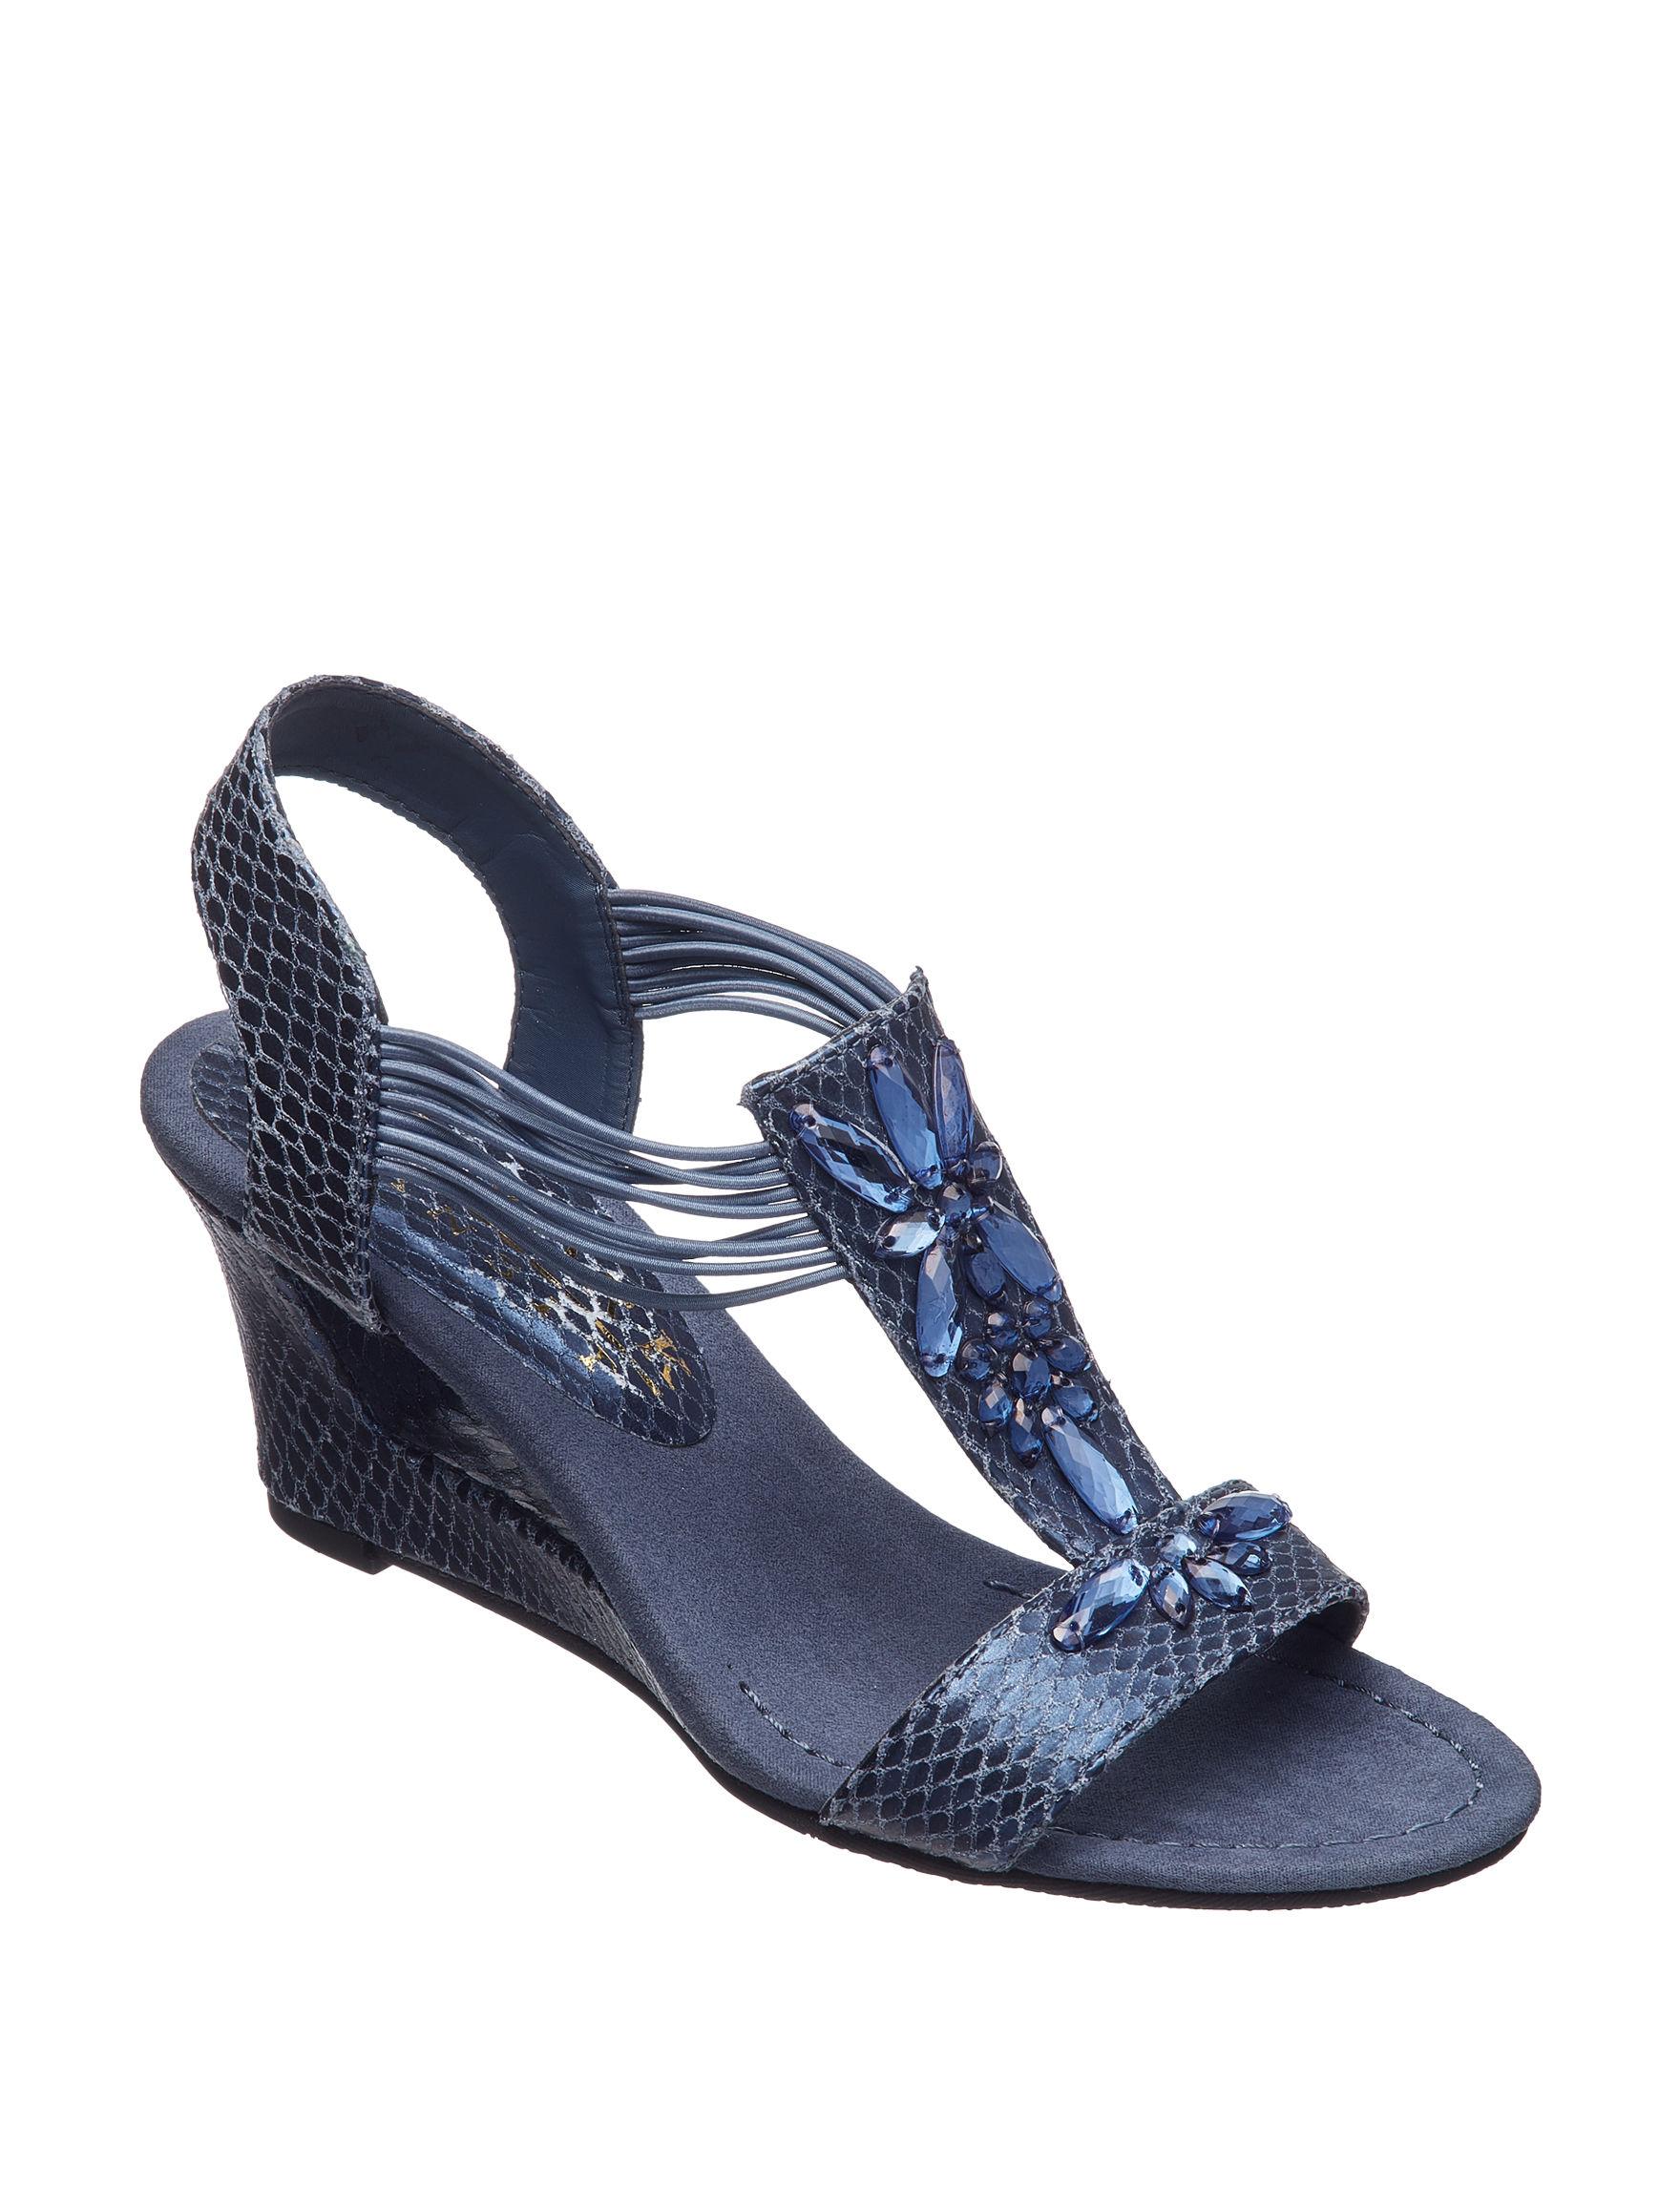 New York Transit Blue Wedge Sandals